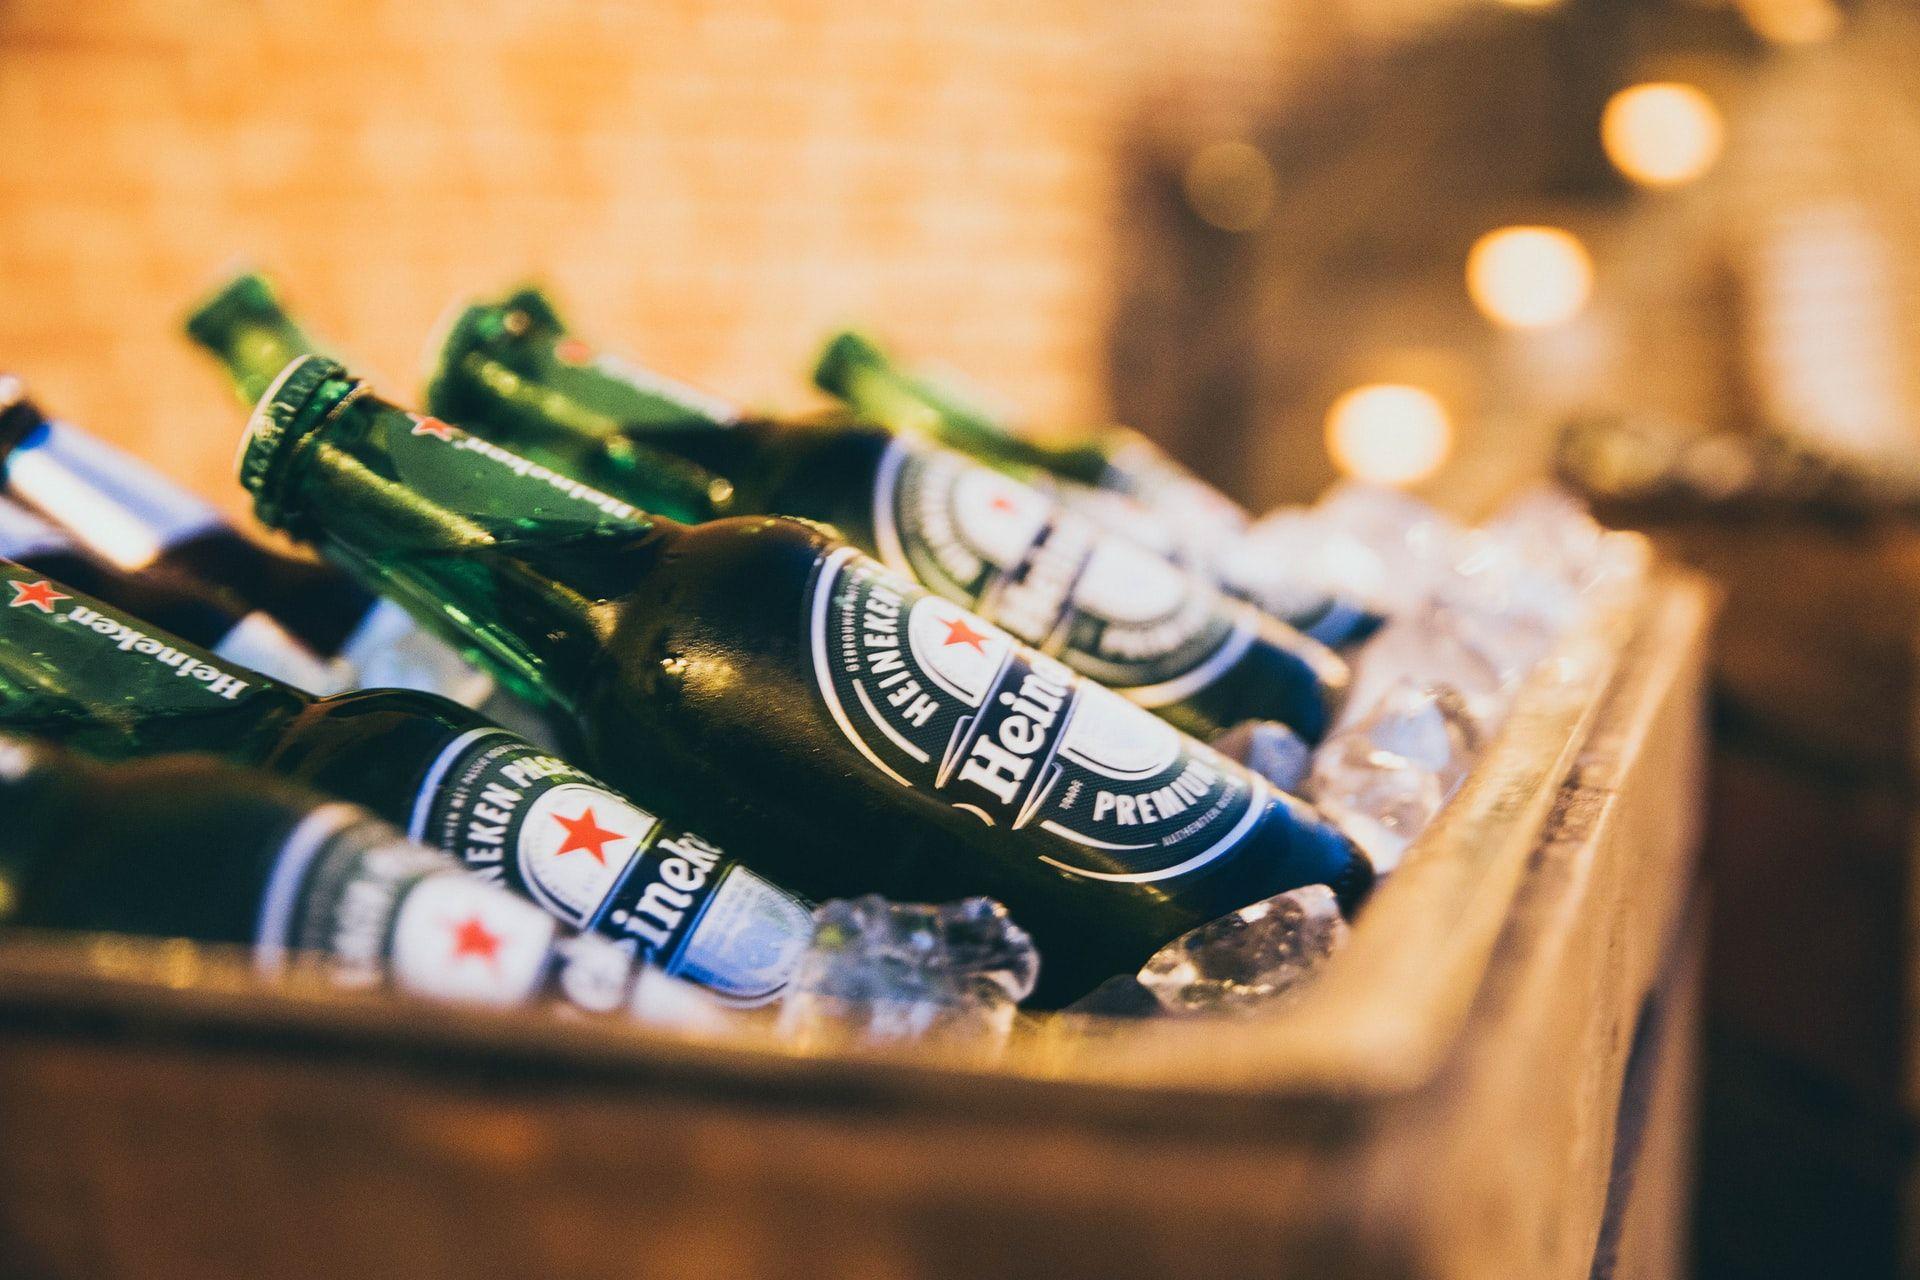 Akibat Paul Pogba Geser Botol, Coca-Cola Lemas, Heineken Puas!